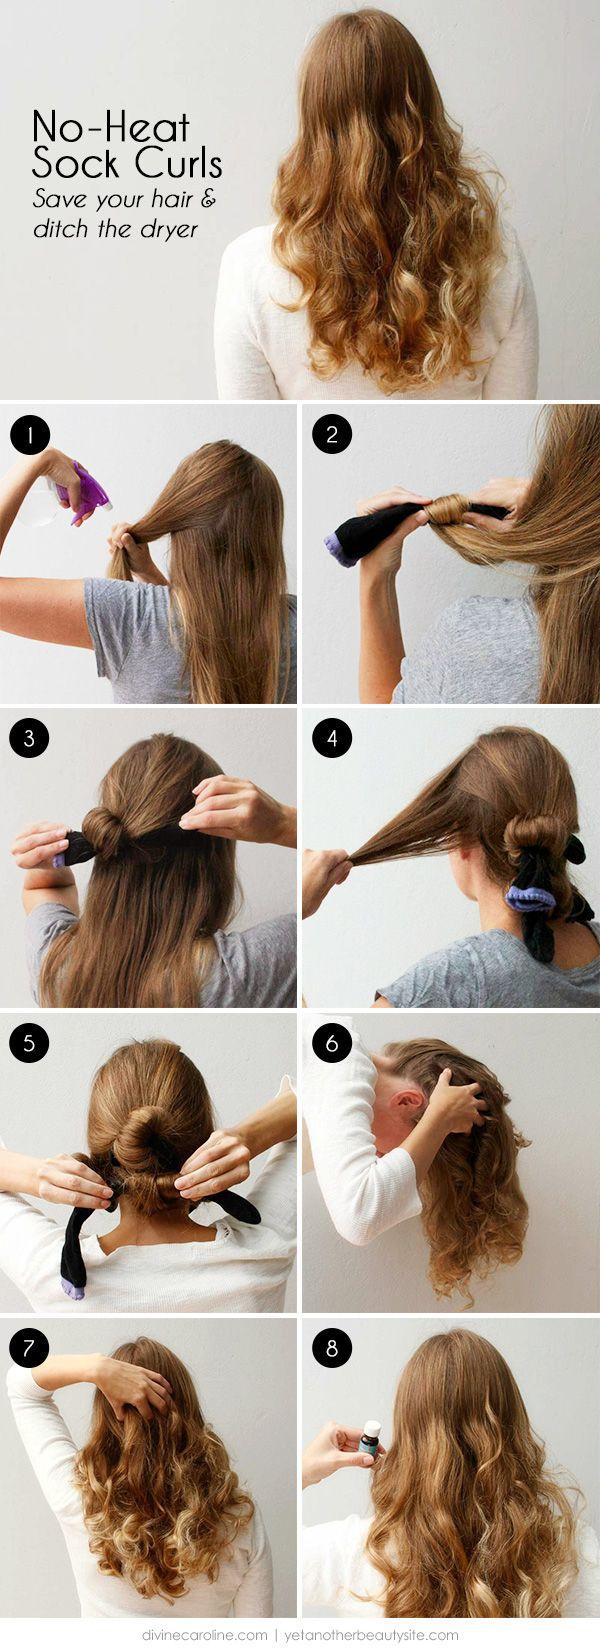 No-Heat Sock Curls: Save Your Hair and Ditch the Dryer | Divine Caroline #hairtutorials #noheatcurls #hair